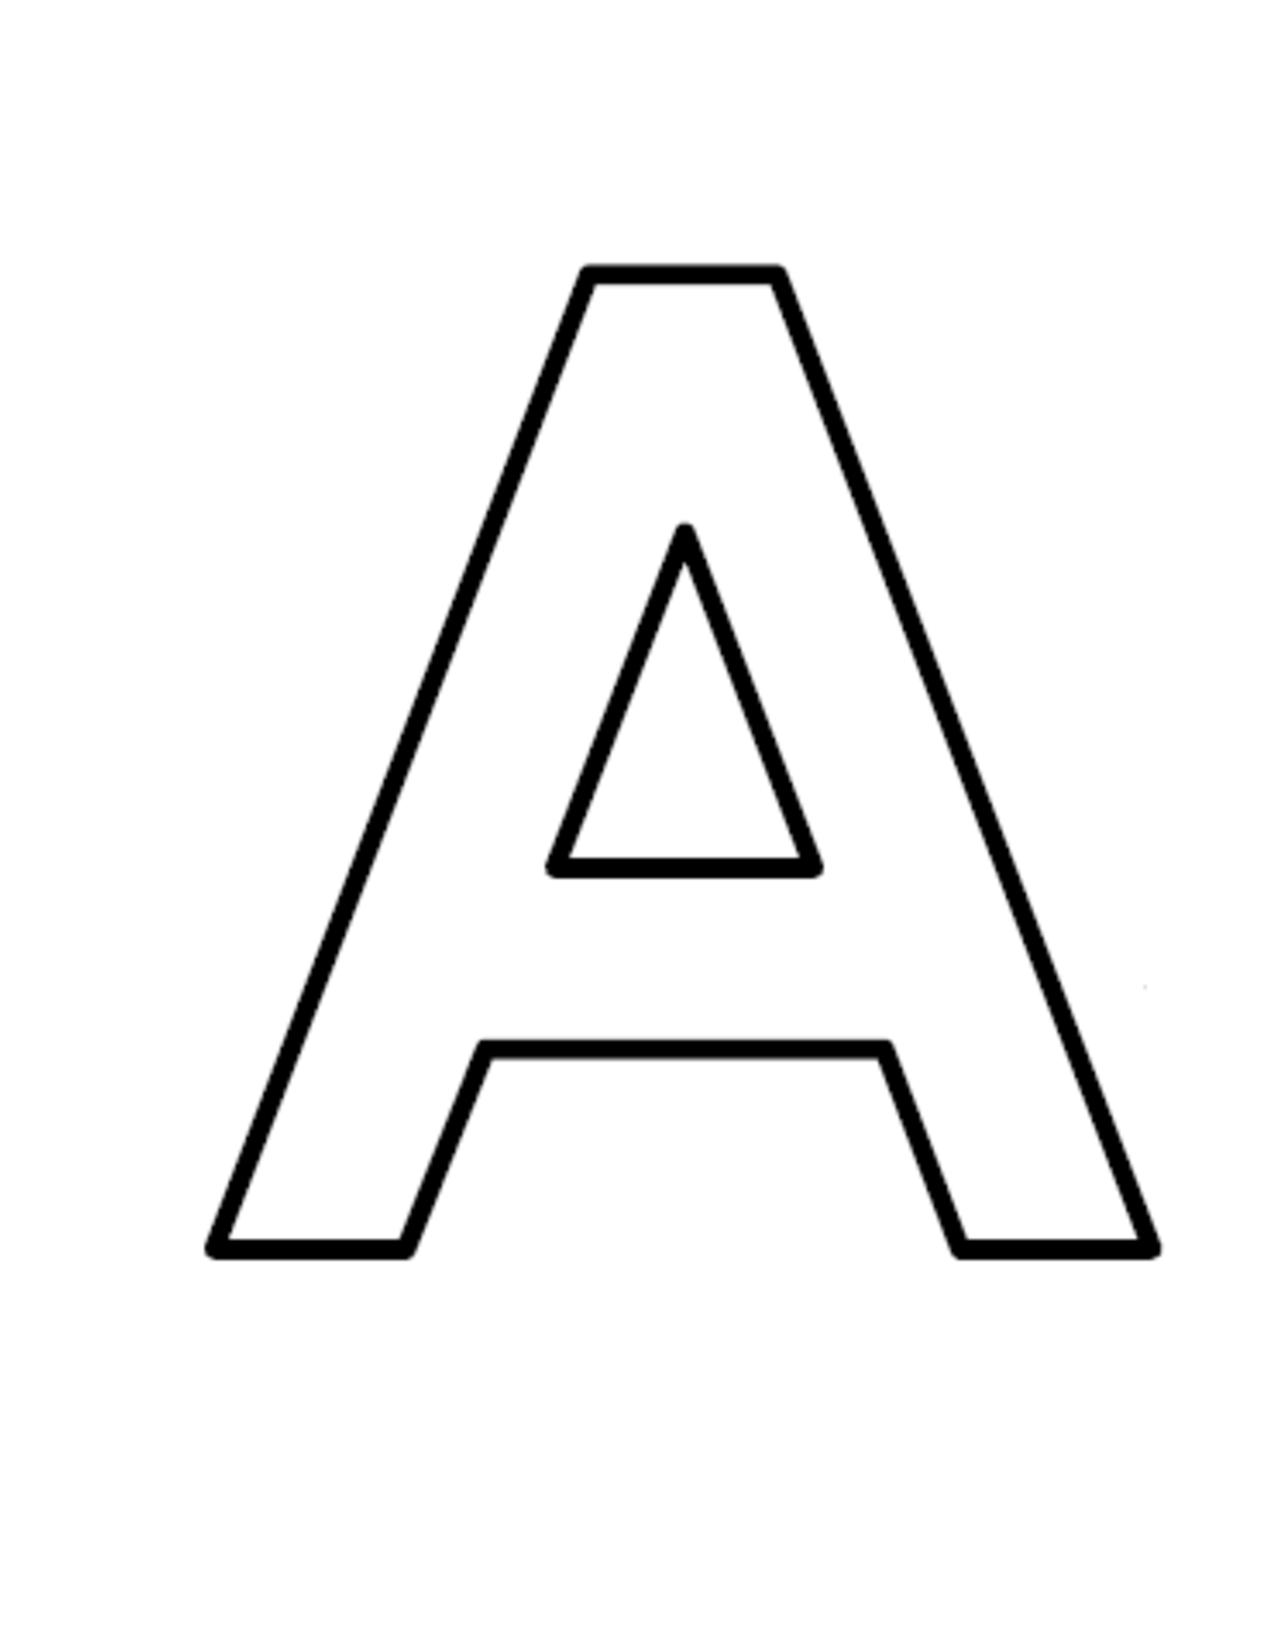 Larger clipart letter a Clipart Large Block Download Letters